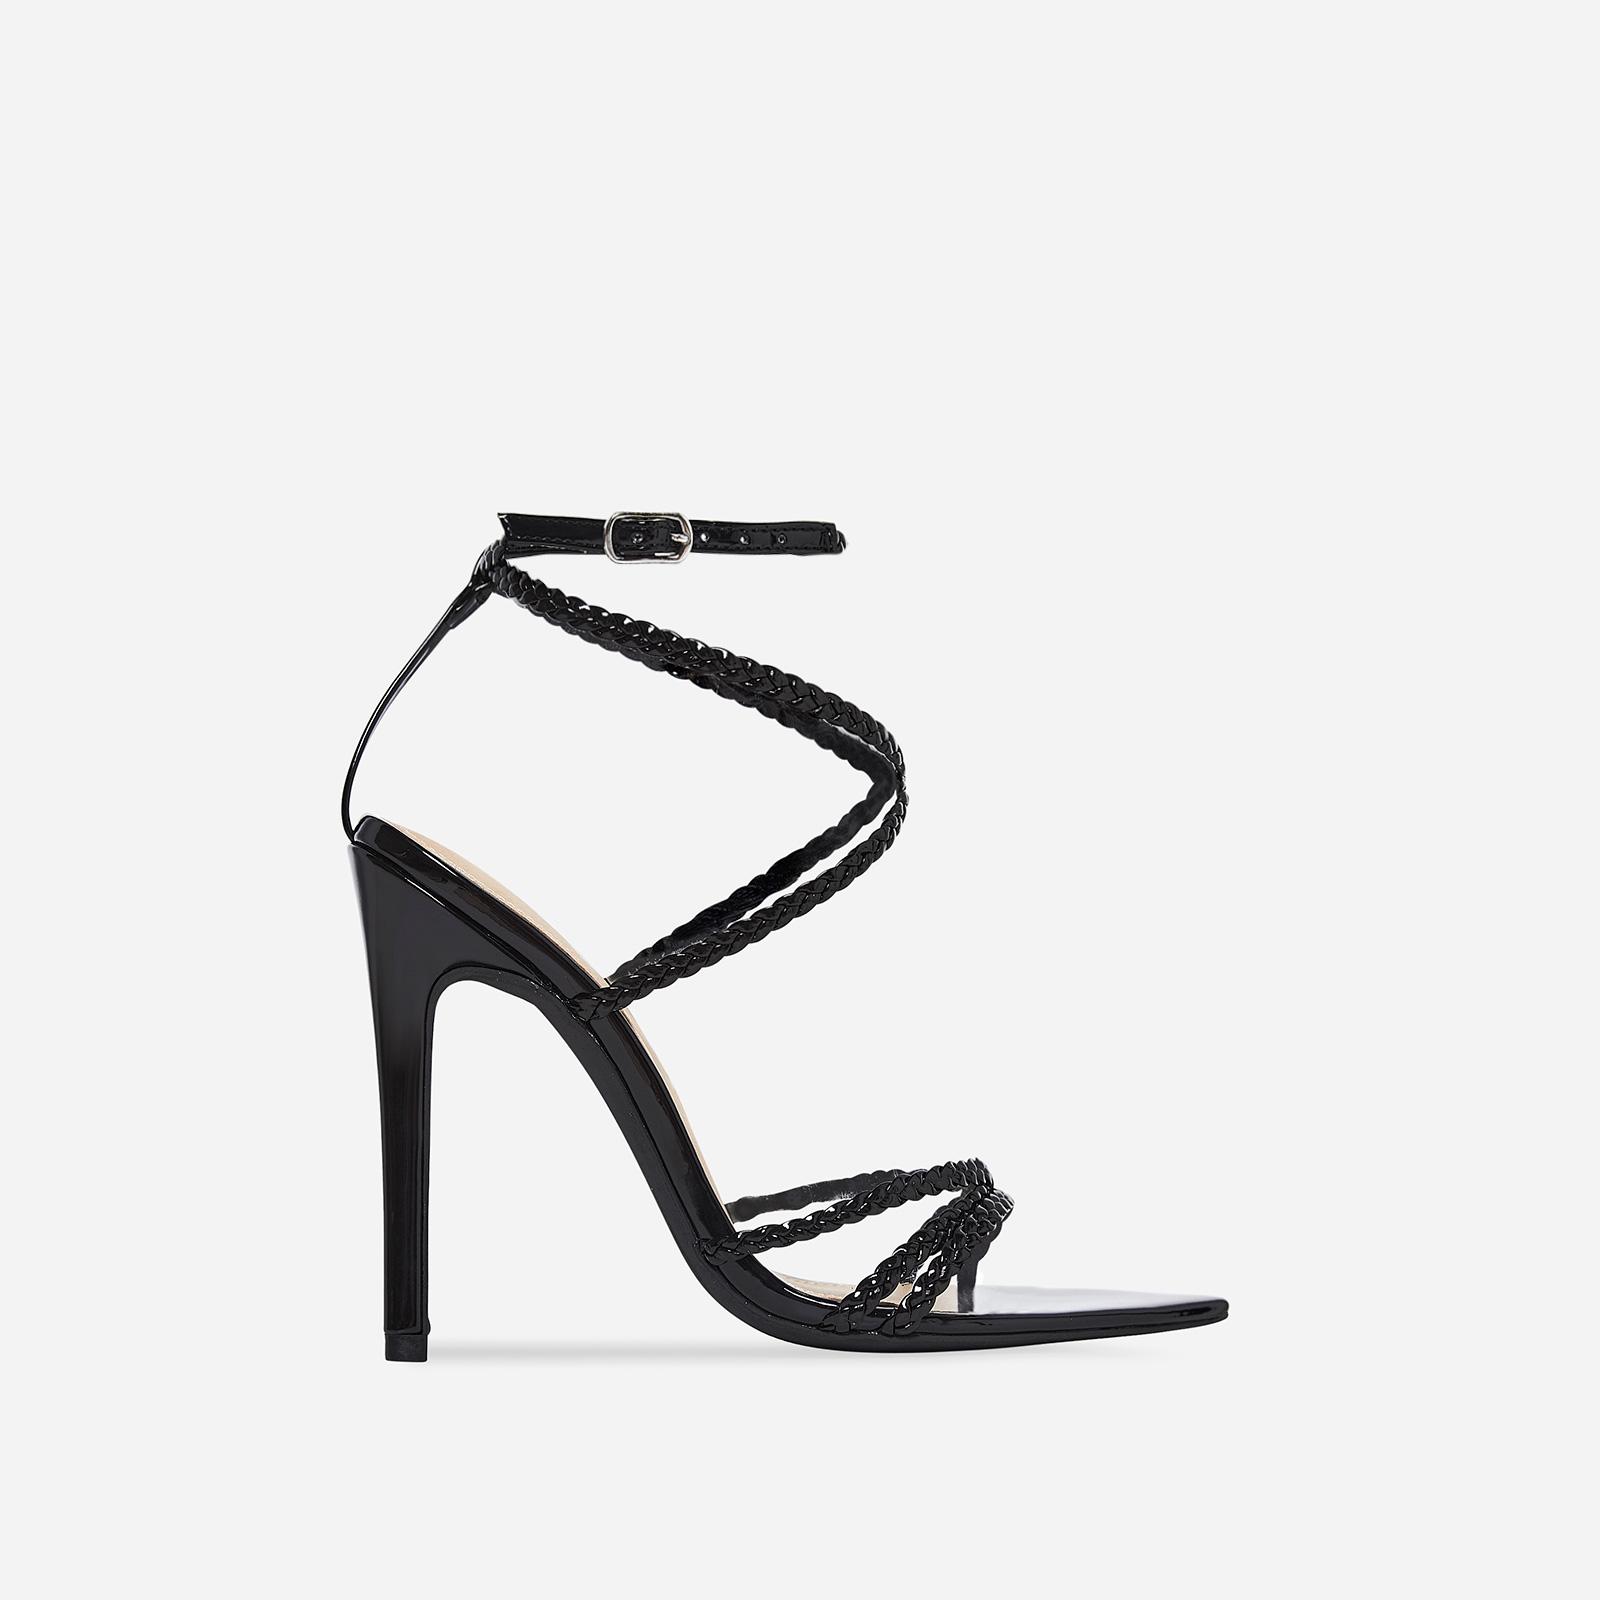 Angela Plaited Pointed Heel In Black Patent